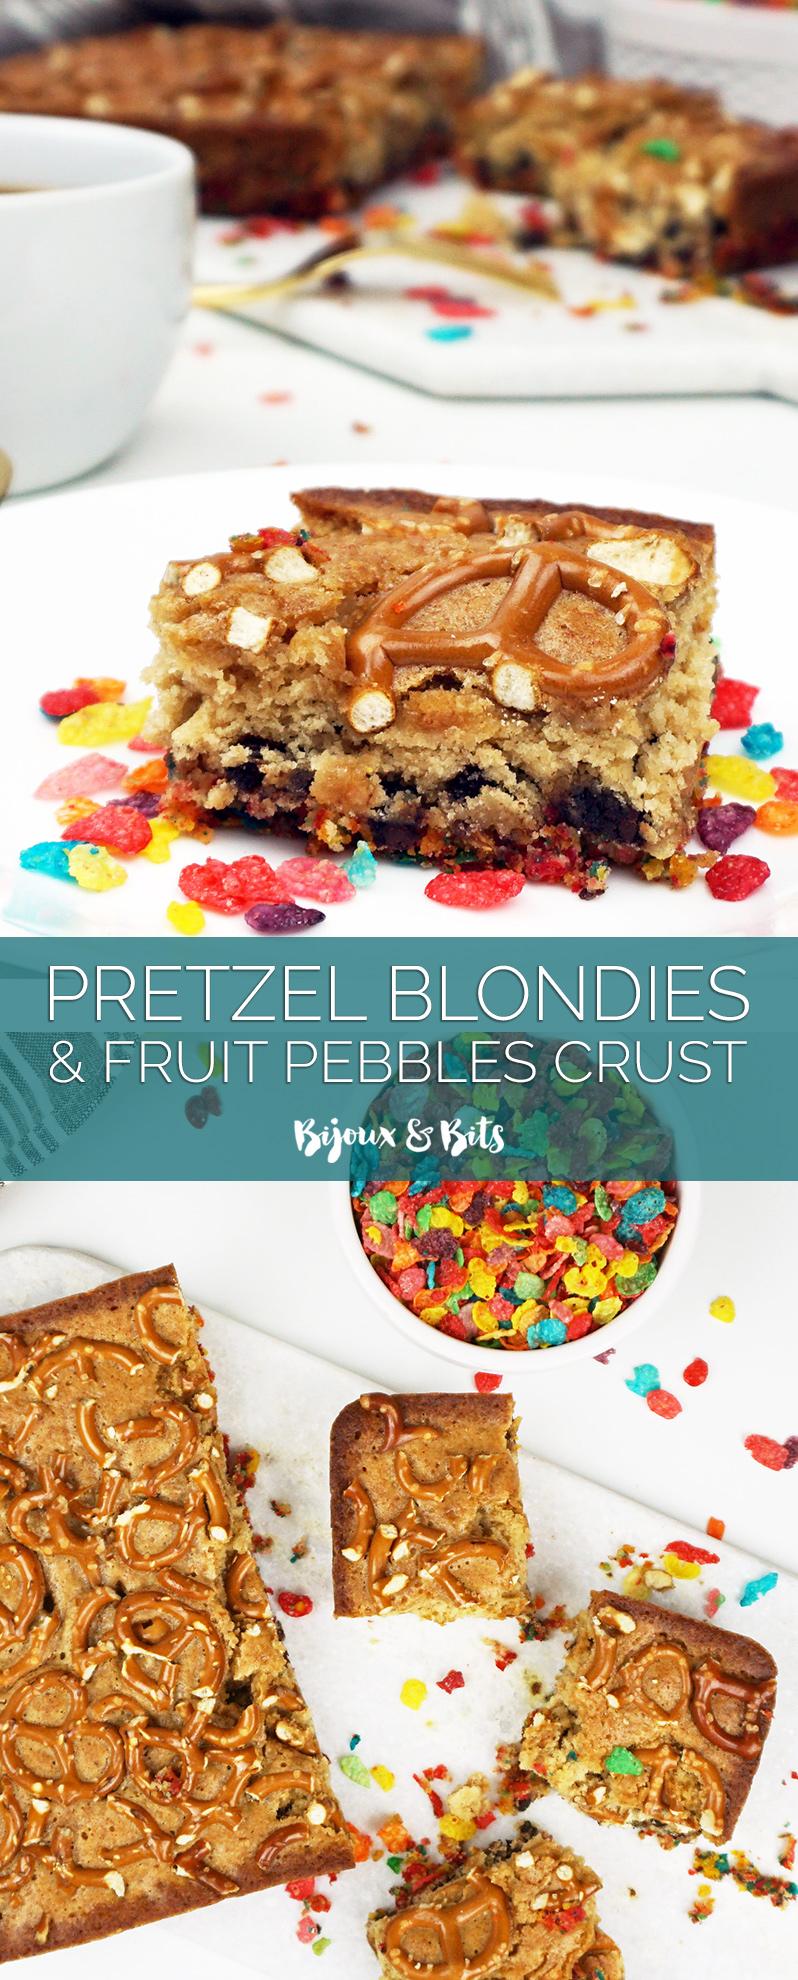 Pretzel blondies with Fruity Pebbles crust from @bijouxandbits